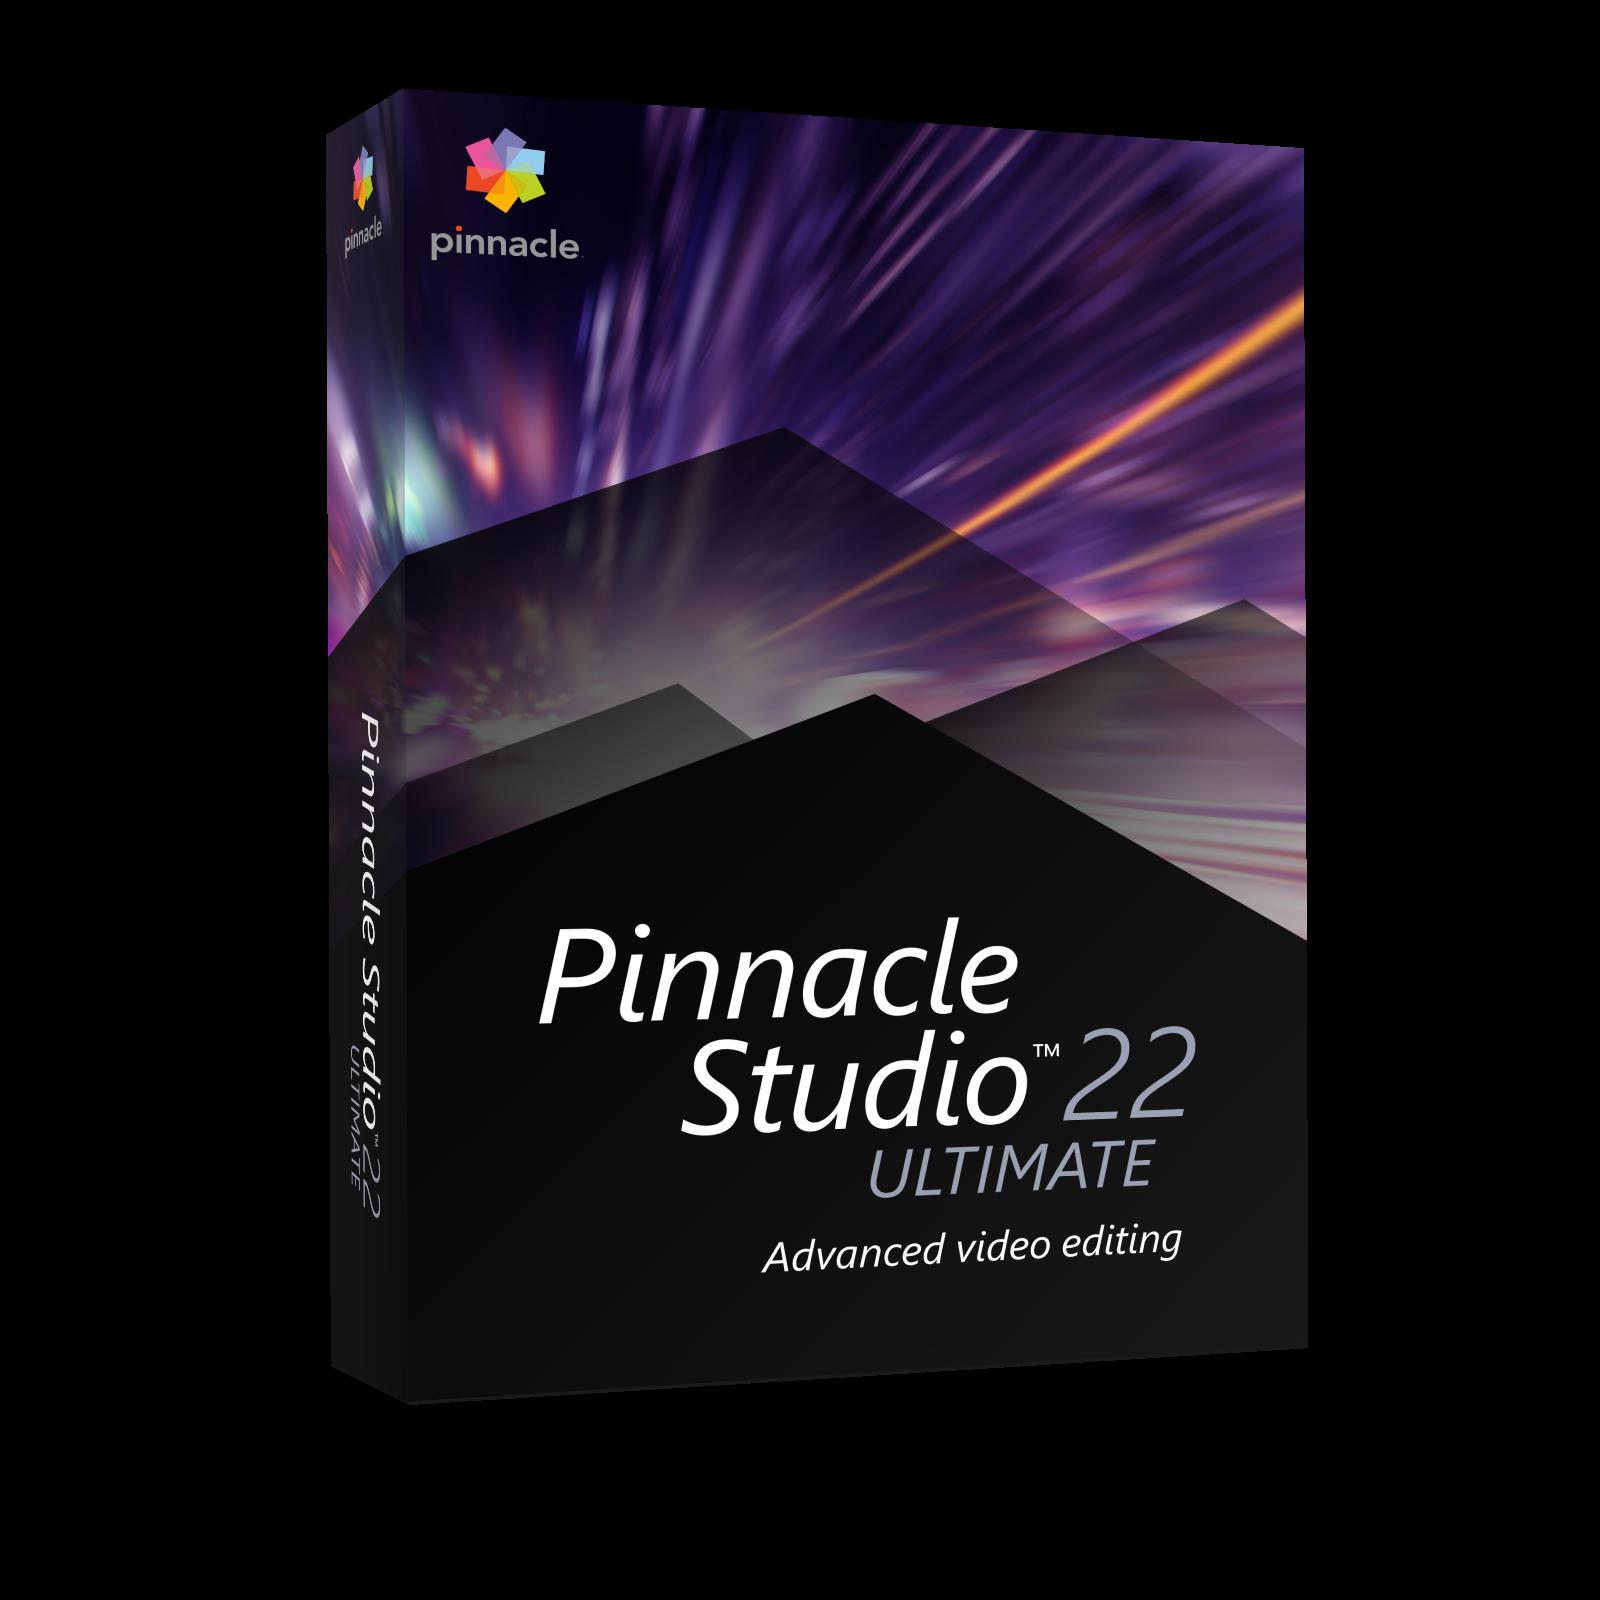 Pinnacle Studio 22 Ultimate CZ Upgrade